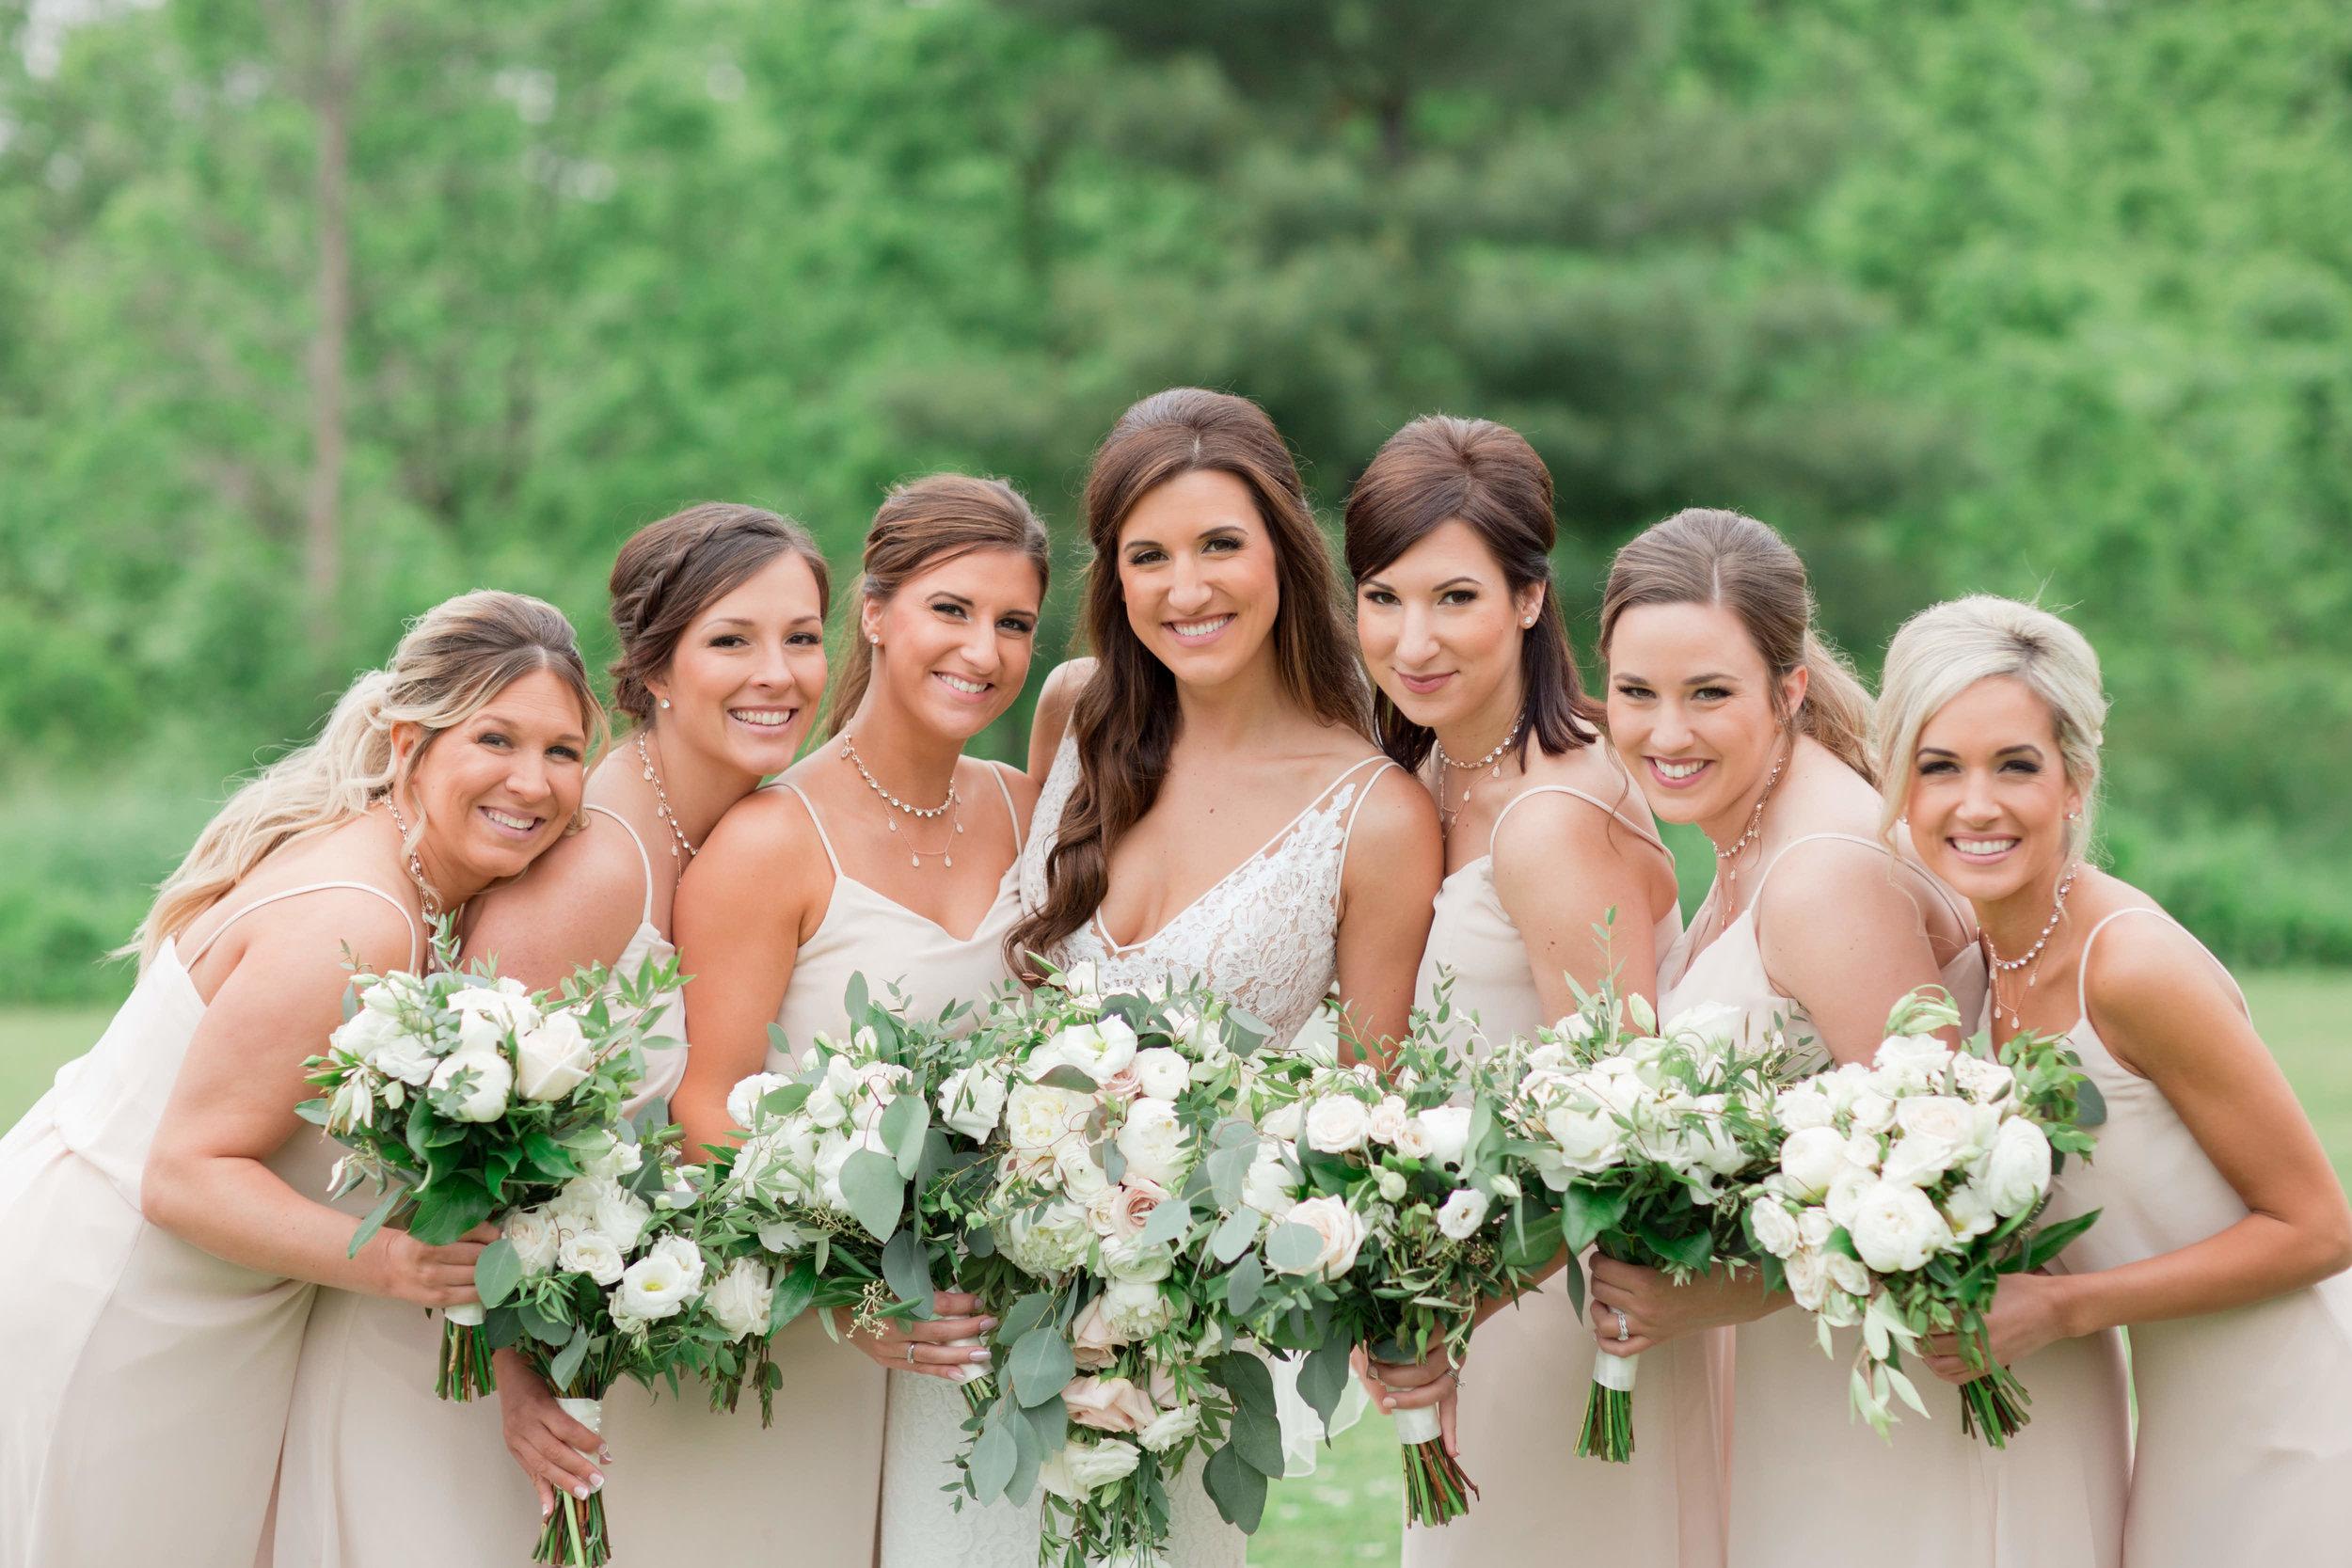 Miranda___Daniel___Daniel_Ricci_Weddings___High_Res._Finals_128.jpg